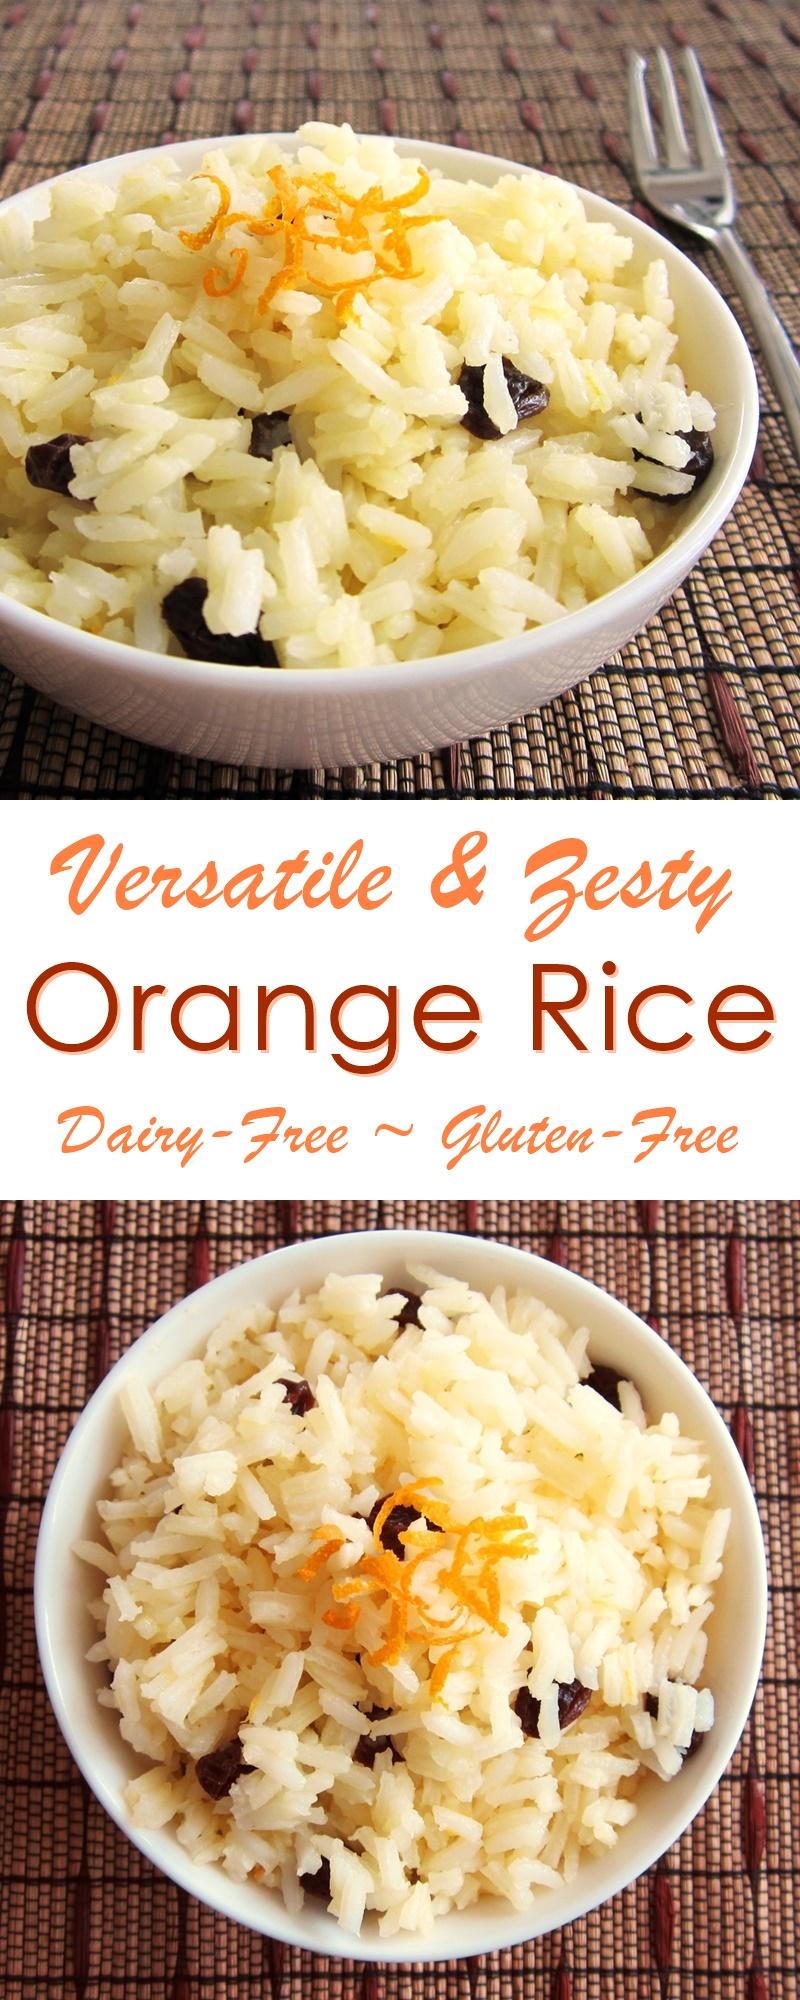 Zesty Orange Raisin Rice Recipe - versatile side dish or breakfast; naturally gluten-free and allergy-friendly